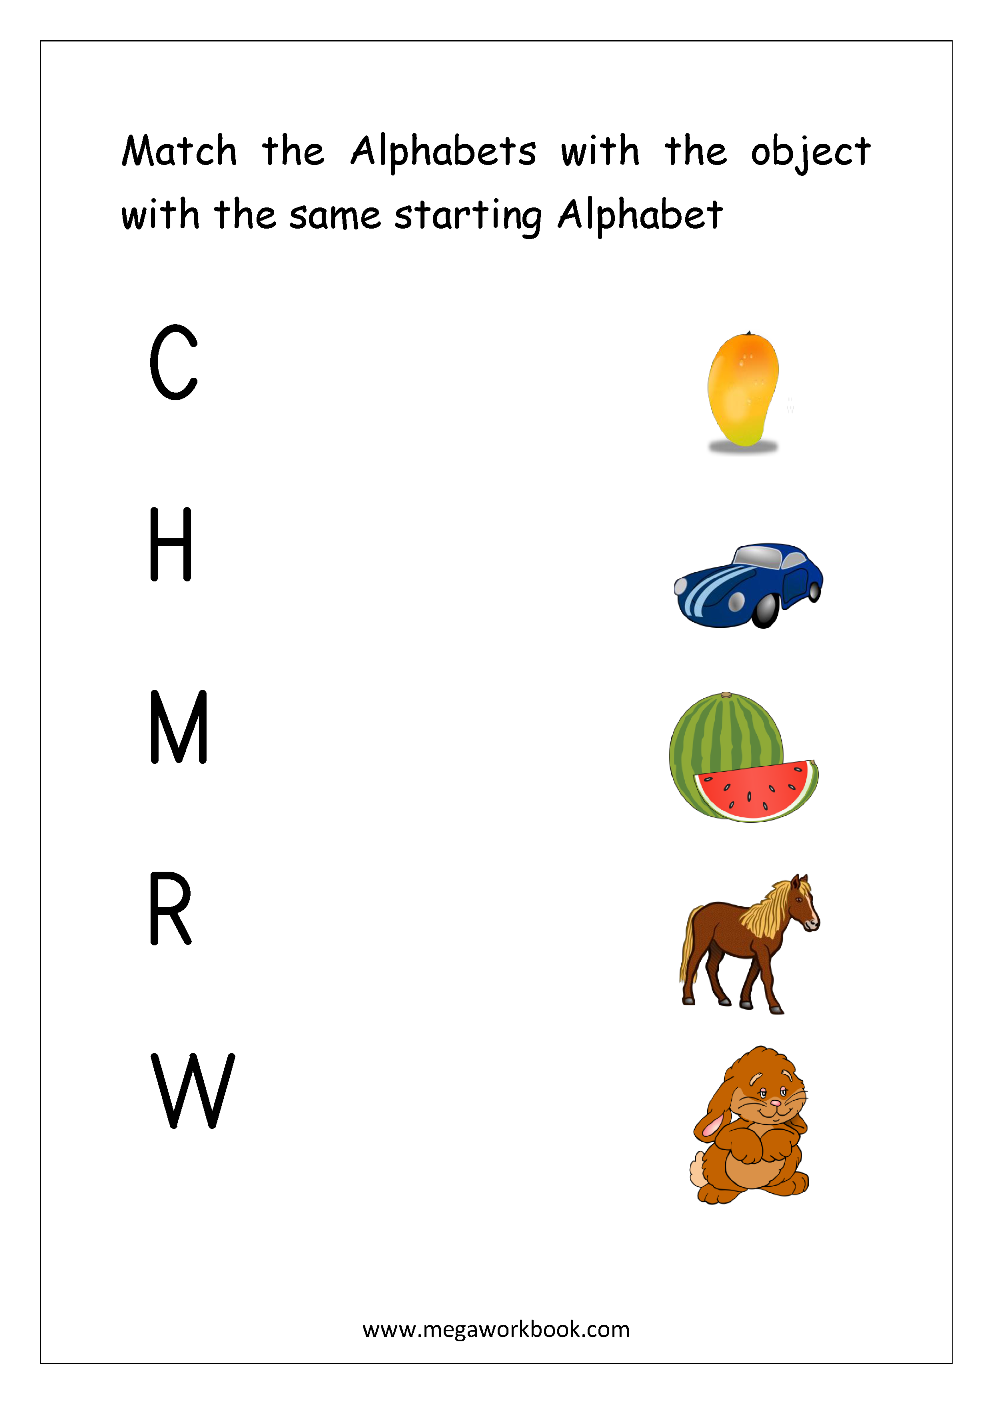 Free English Worksheets - Alphabet Matching - MegaWorkbook